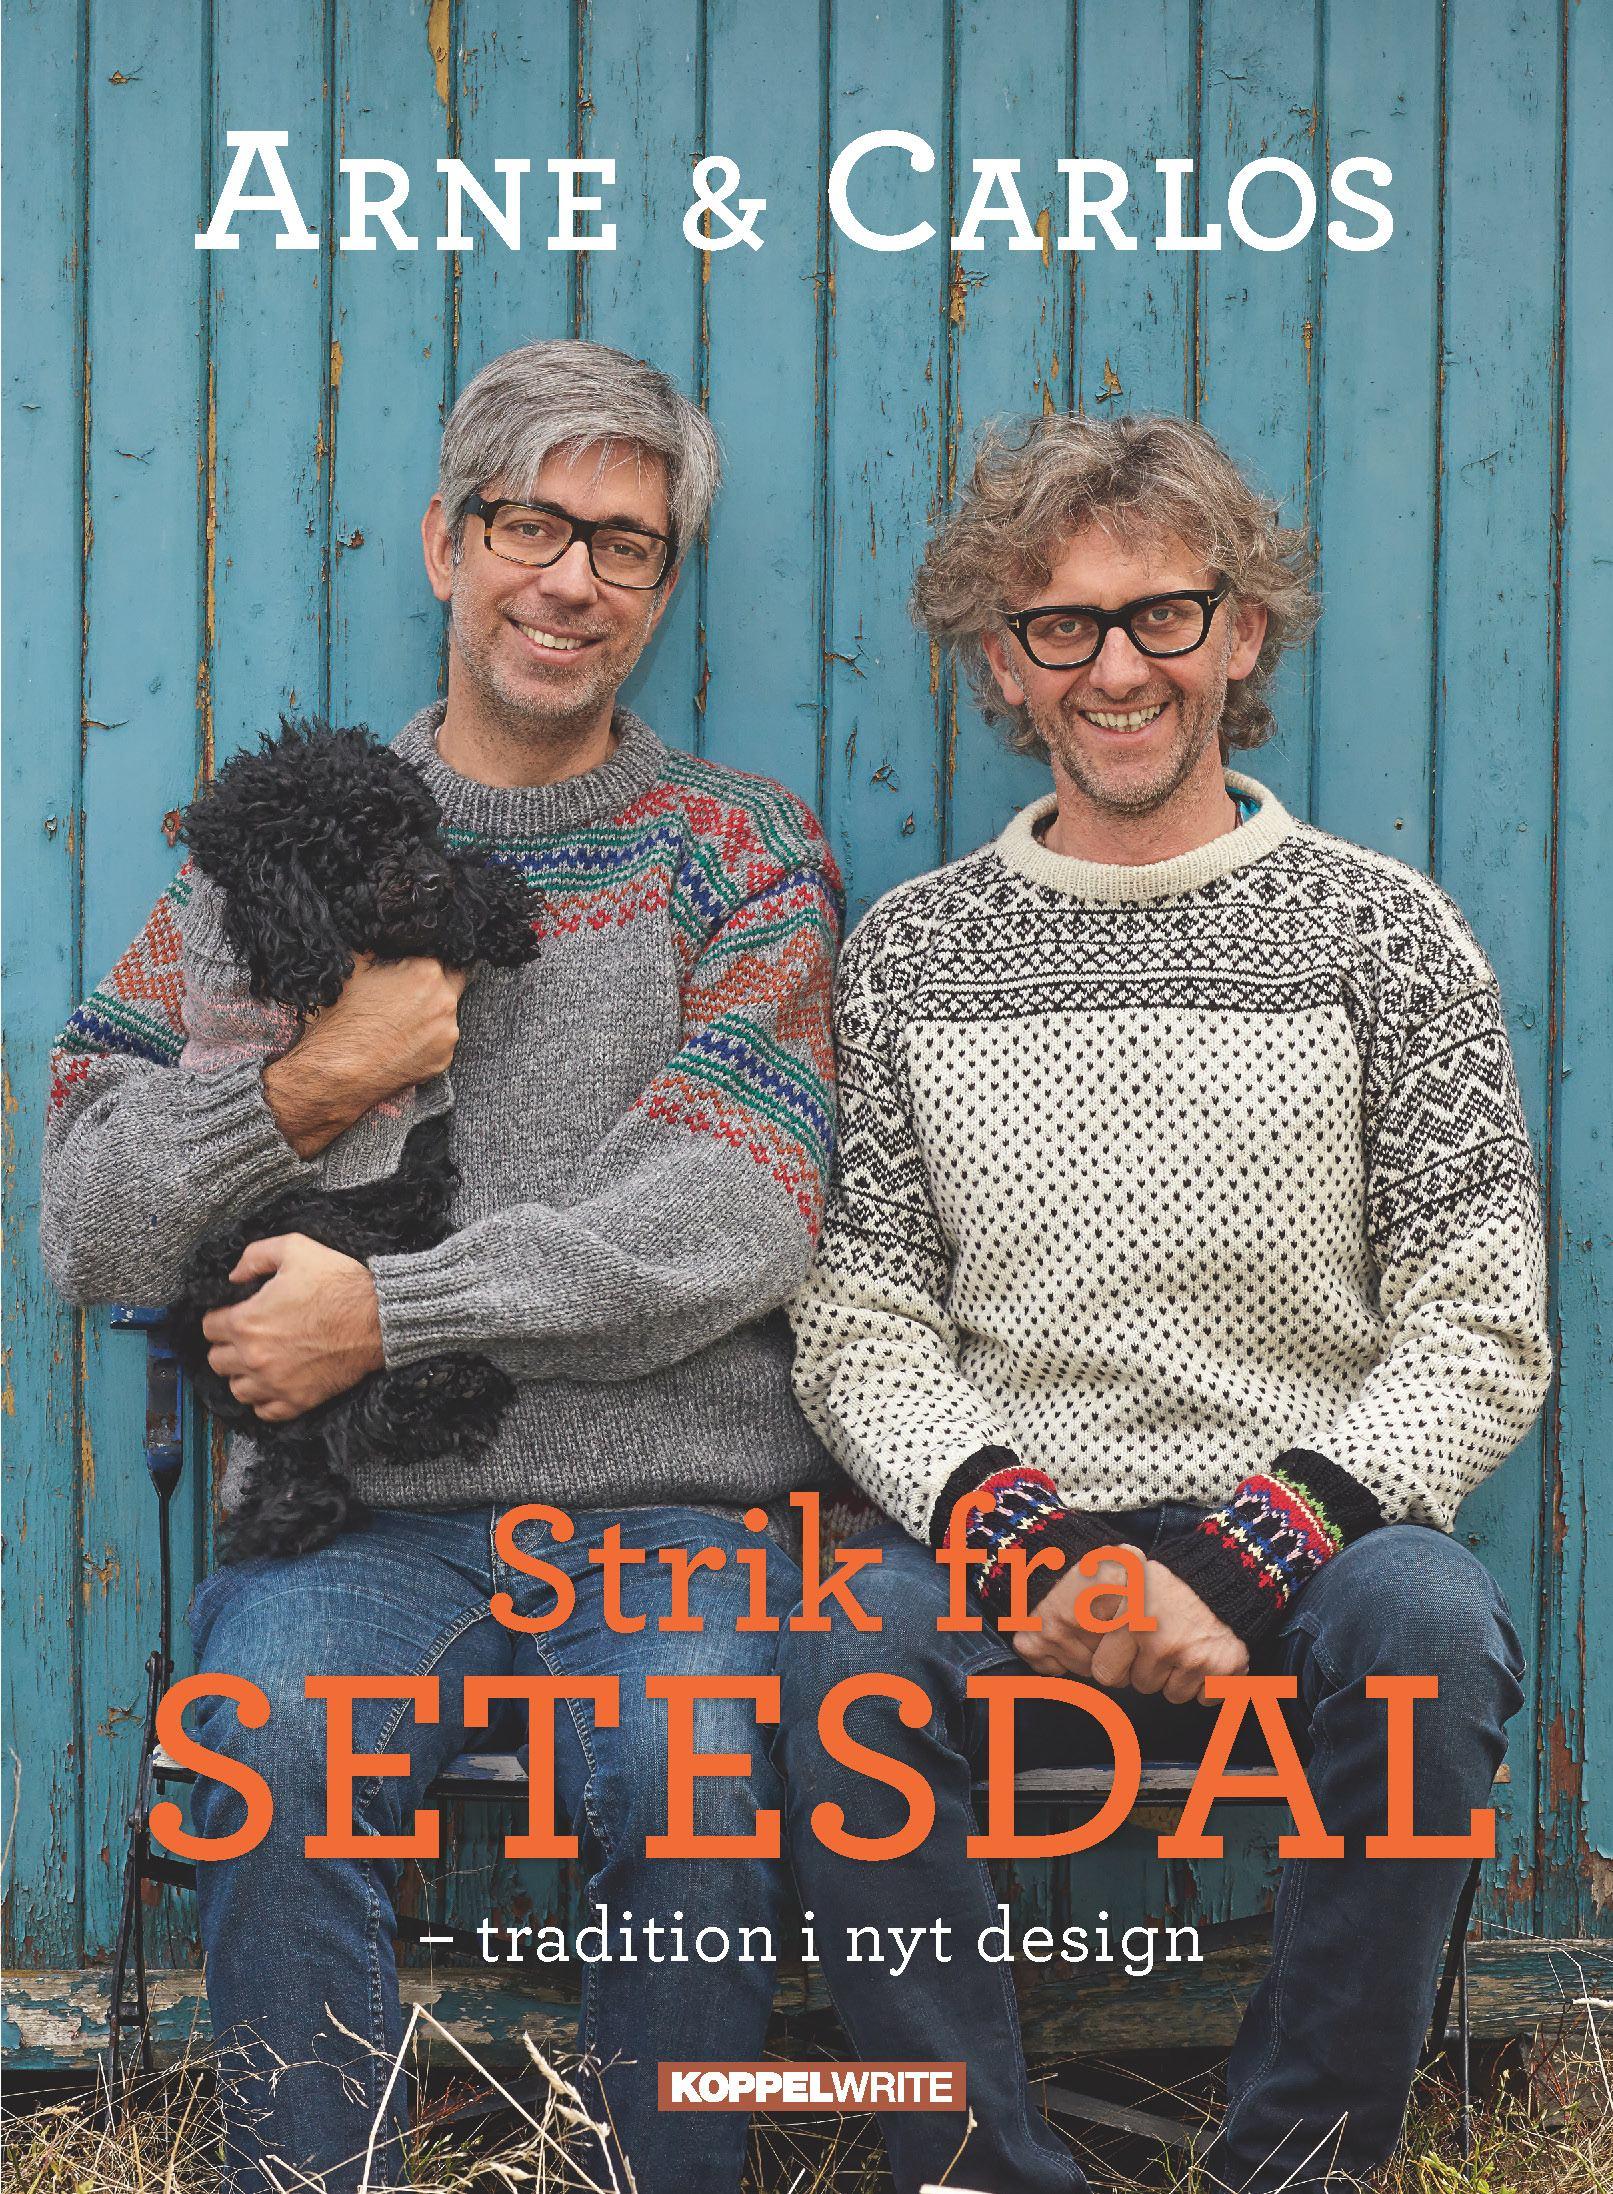 Arne & Carlos Strik fra Setesdal